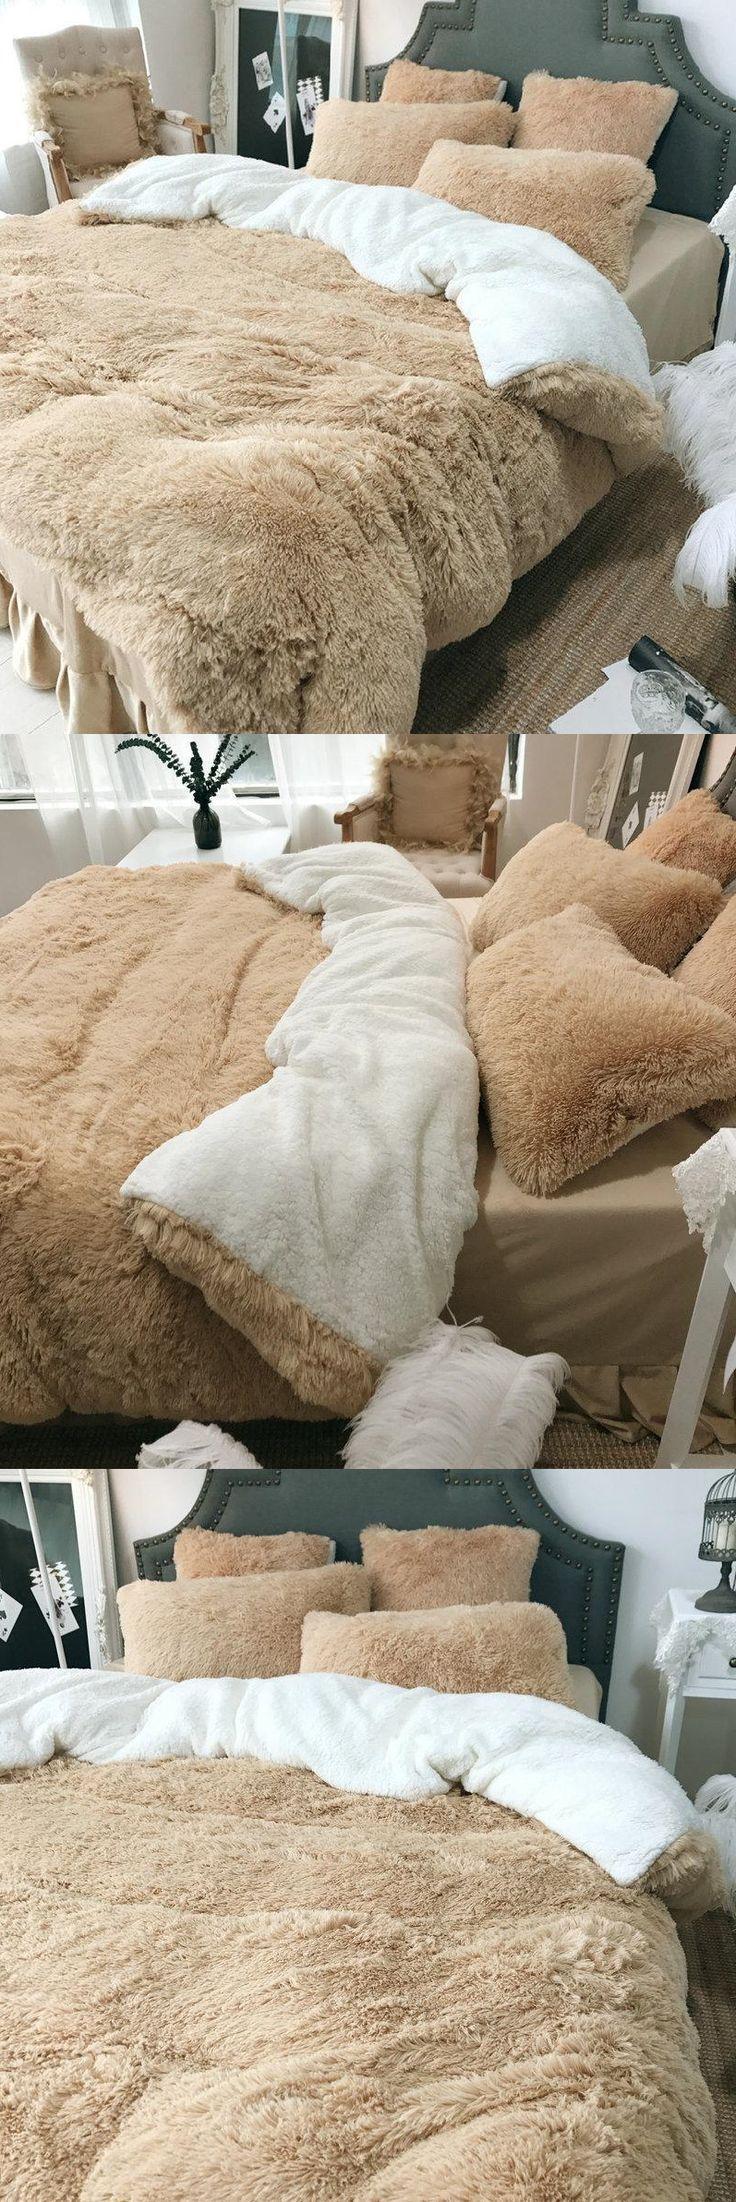 $119.99 USD 4Pcs Coral Fleece Shearling Bedding Set Sheet Warm Mink Cashmere Cover Pillowcase